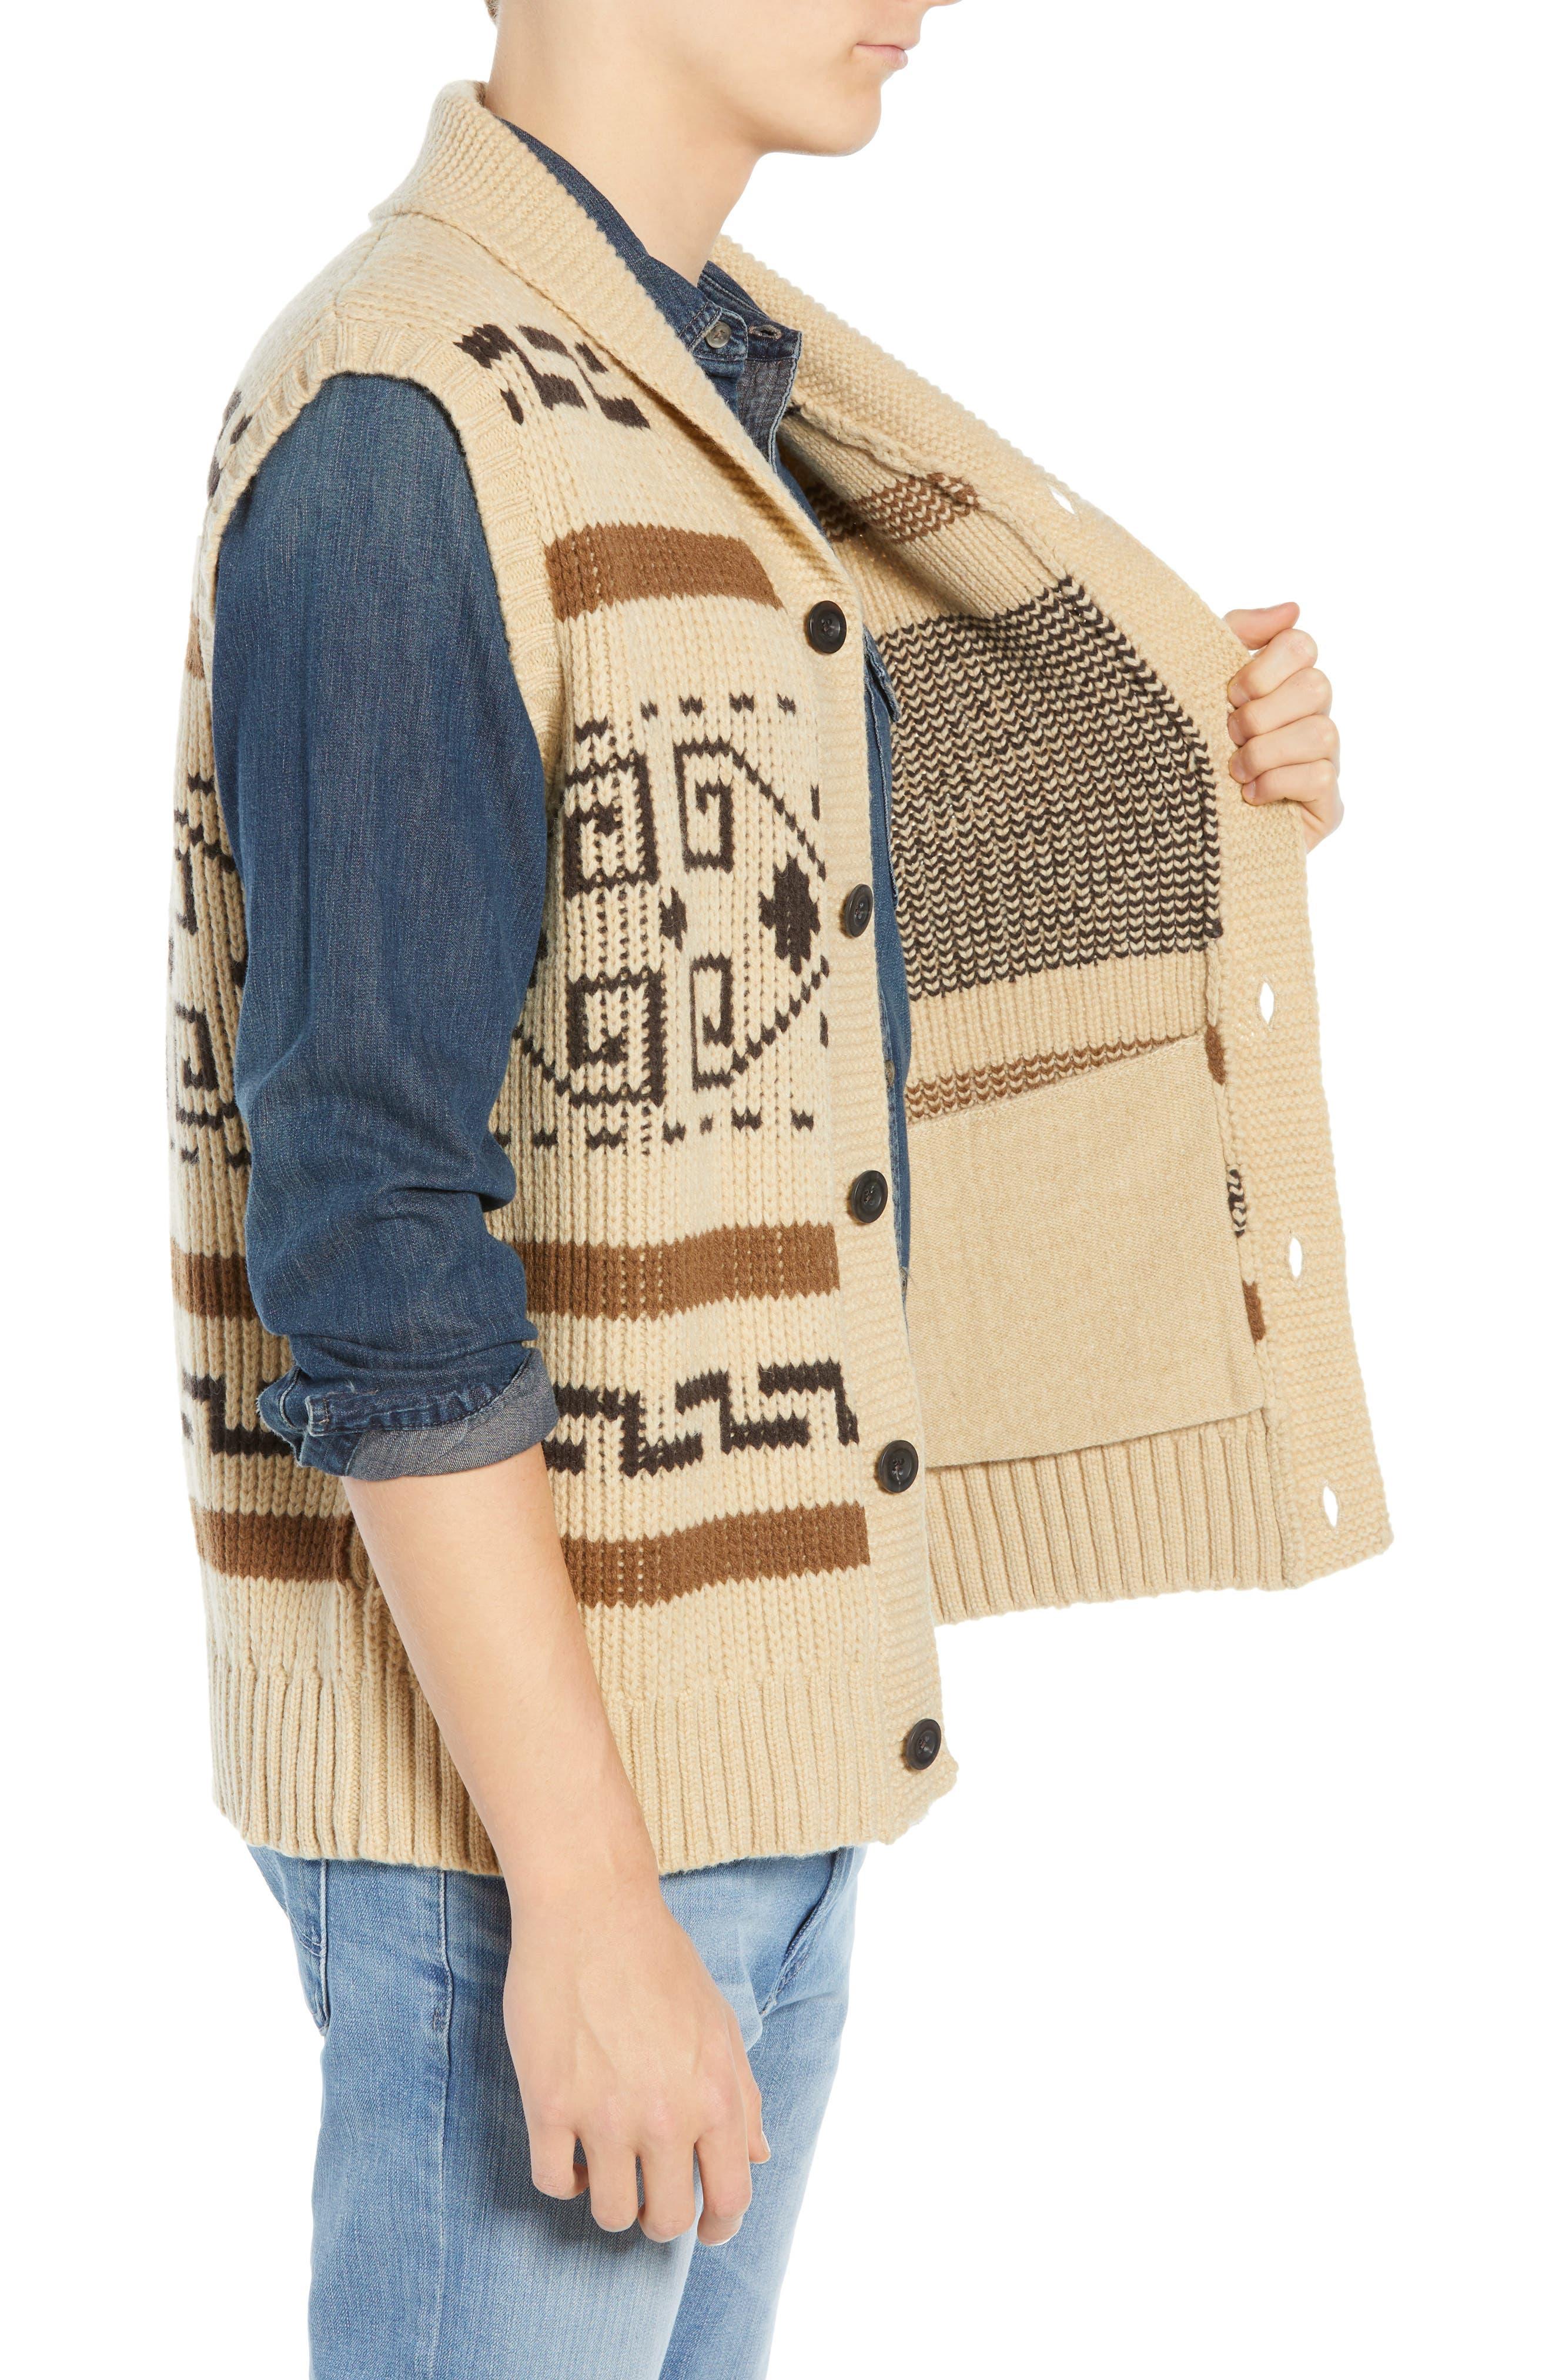 Original Westerley Sweater Vest,                             Alternate thumbnail 3, color,                             TAN/ BROWN